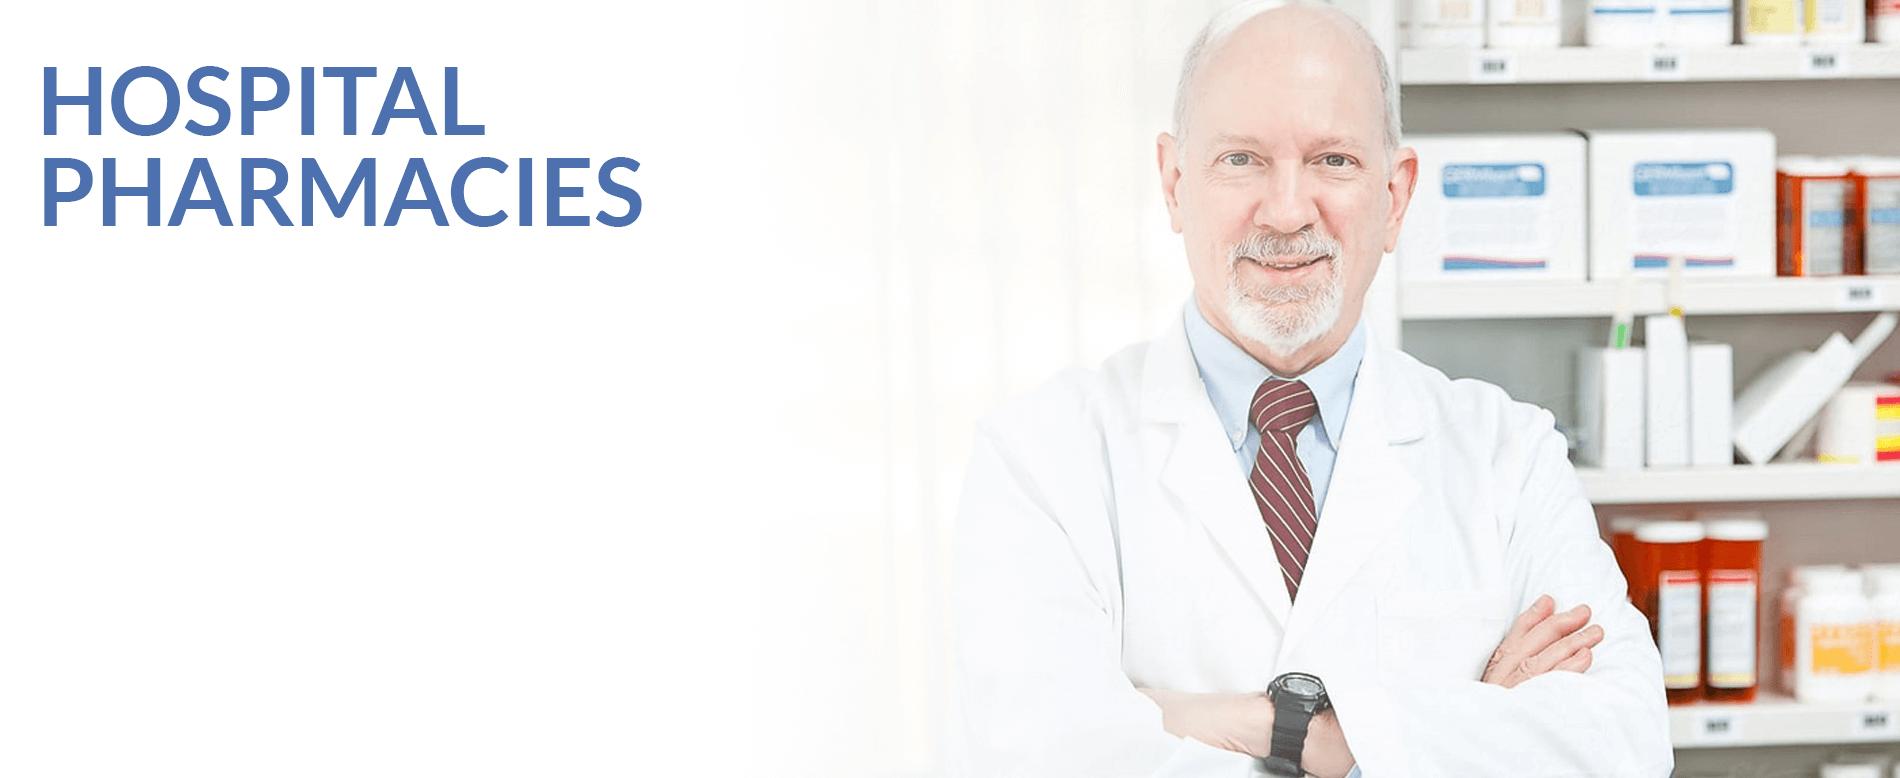 Hospital Pharmacies Meditec